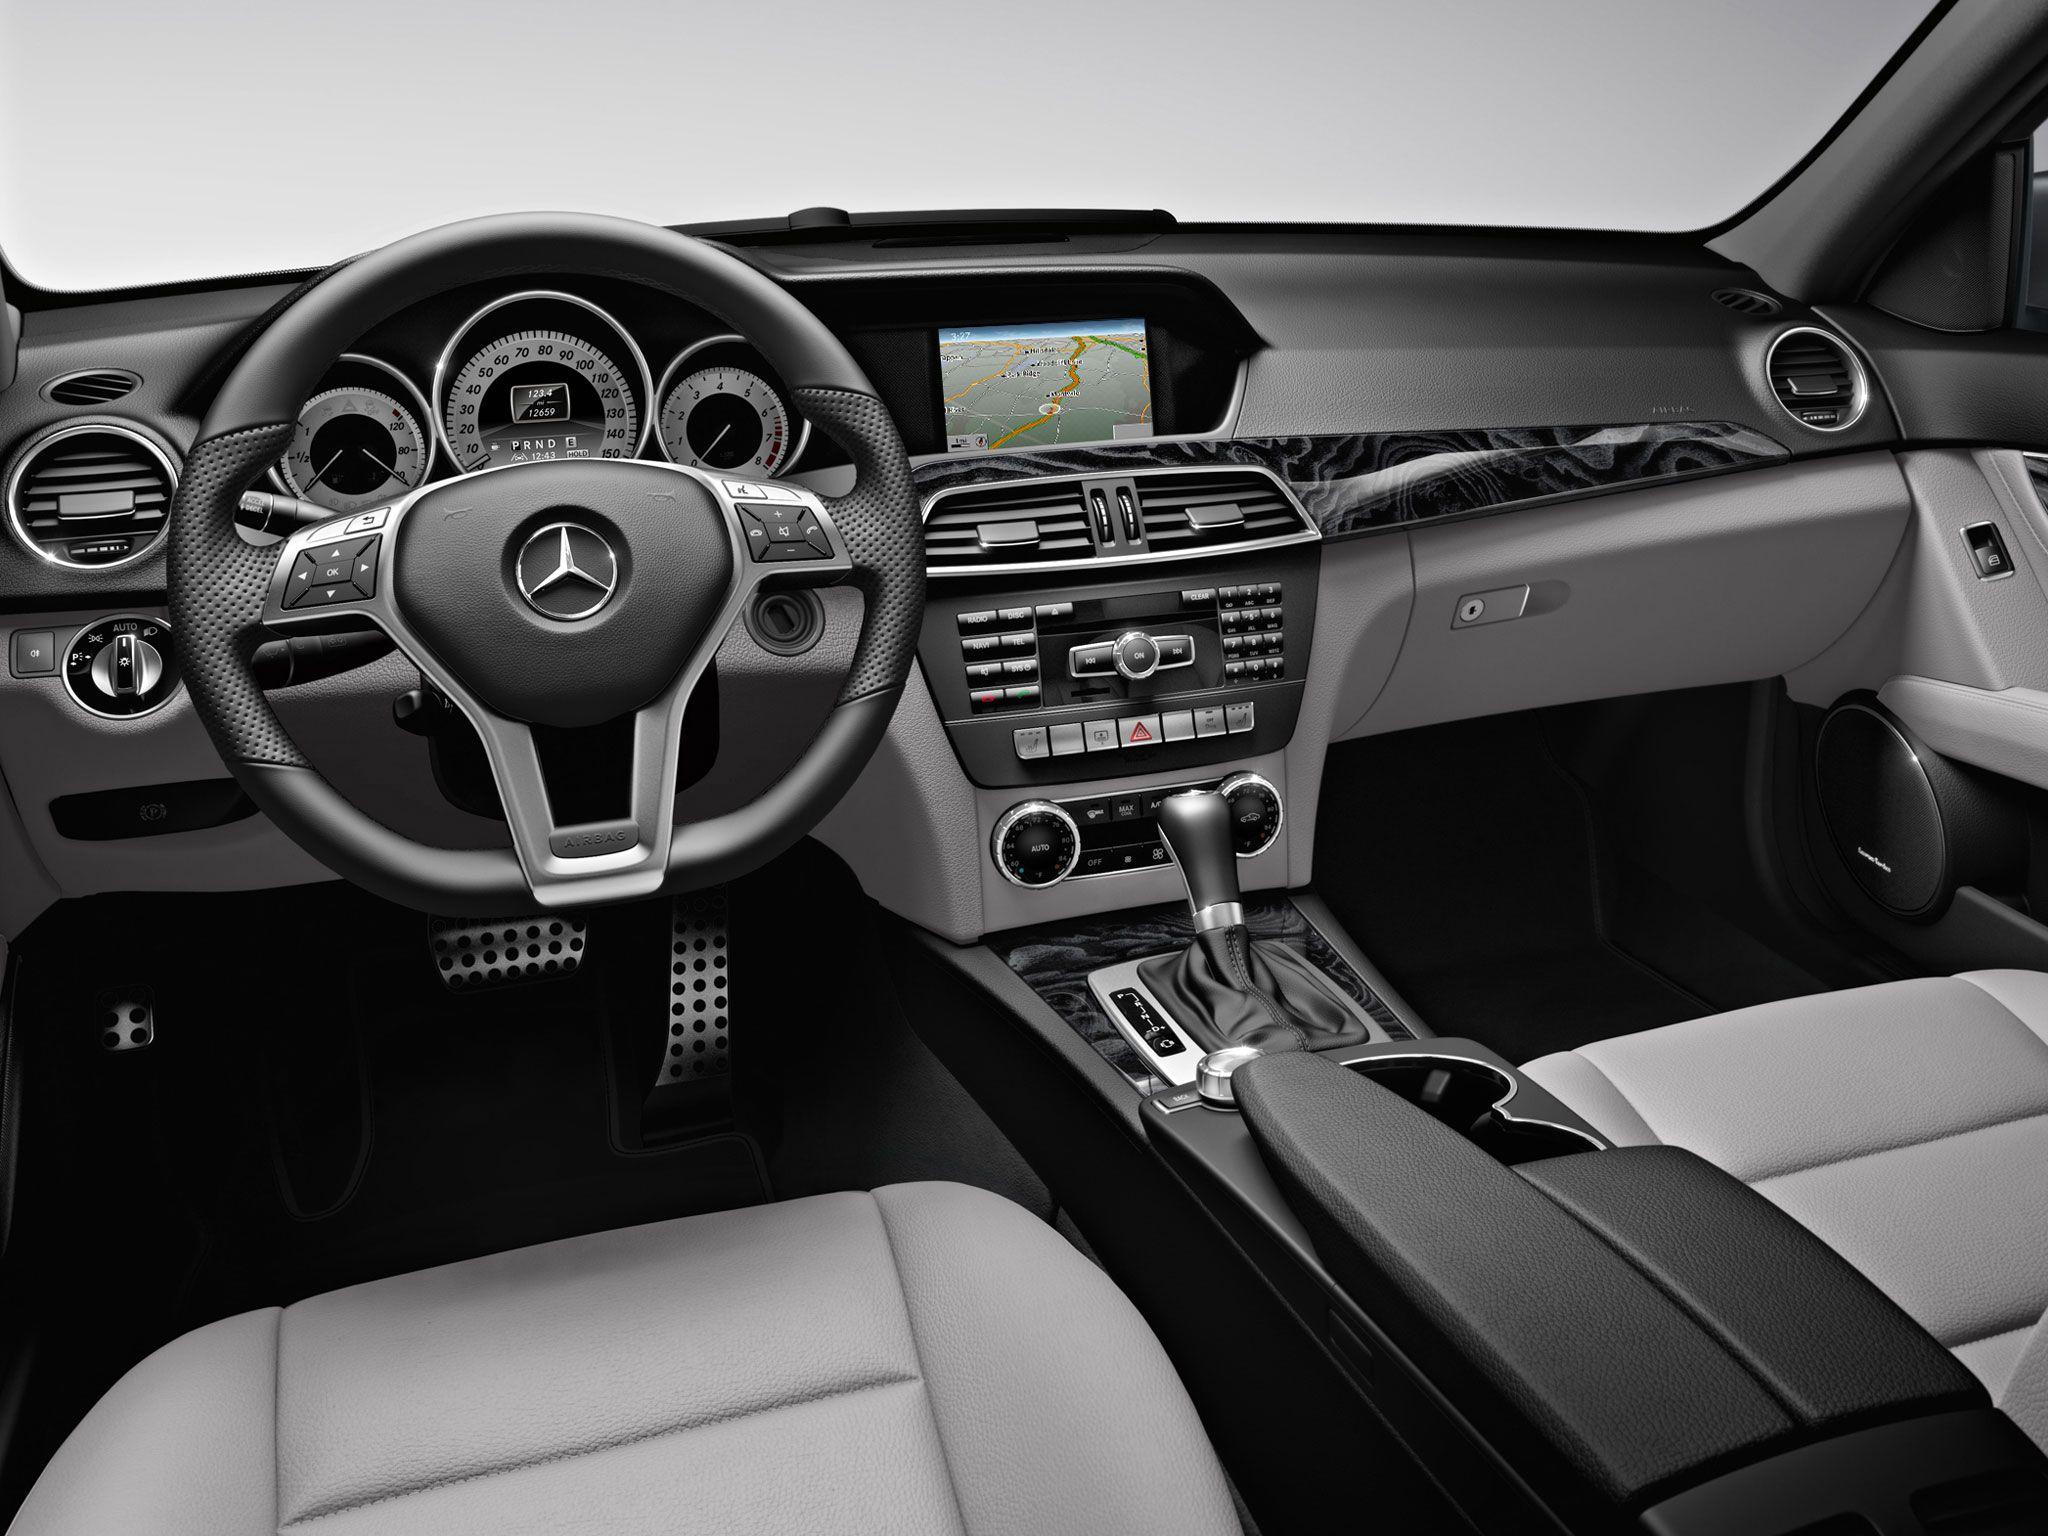 2013 Mercedes C350 Sedan Interior In Ash Leather My New